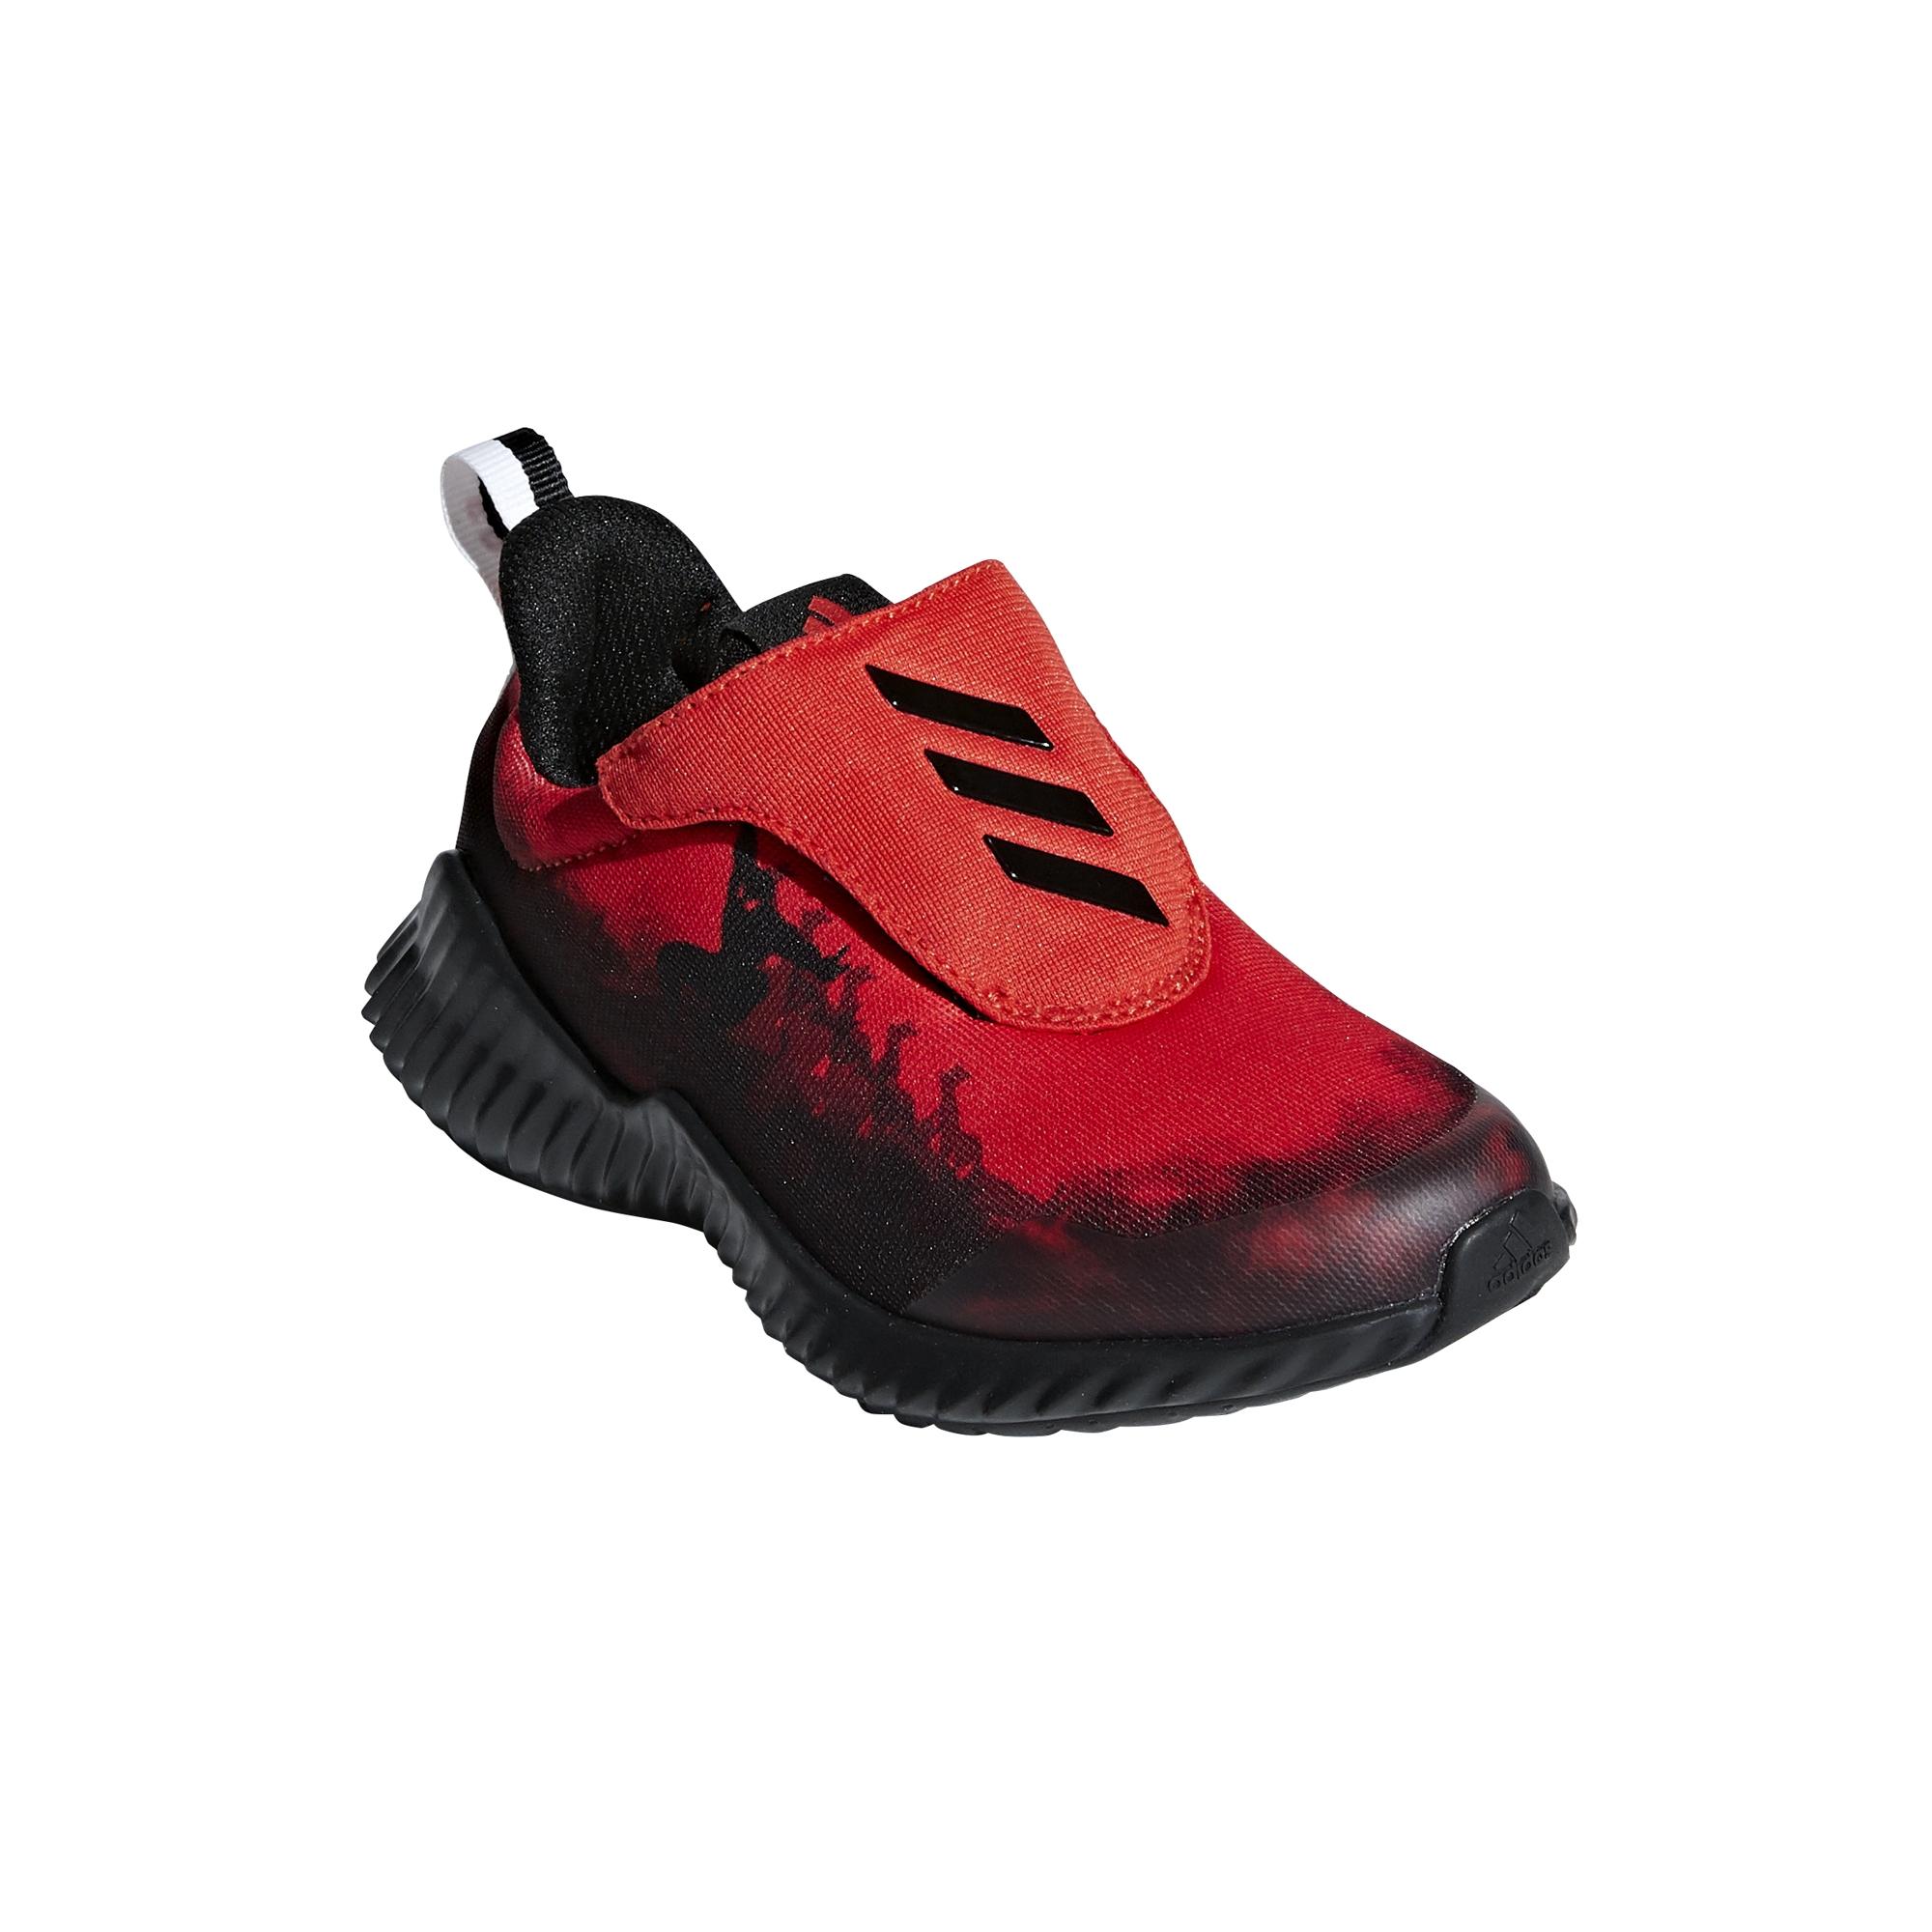 hot sale online a9dac 8347d Chaussures kid adidas Marvel Spider-Man FortaRun